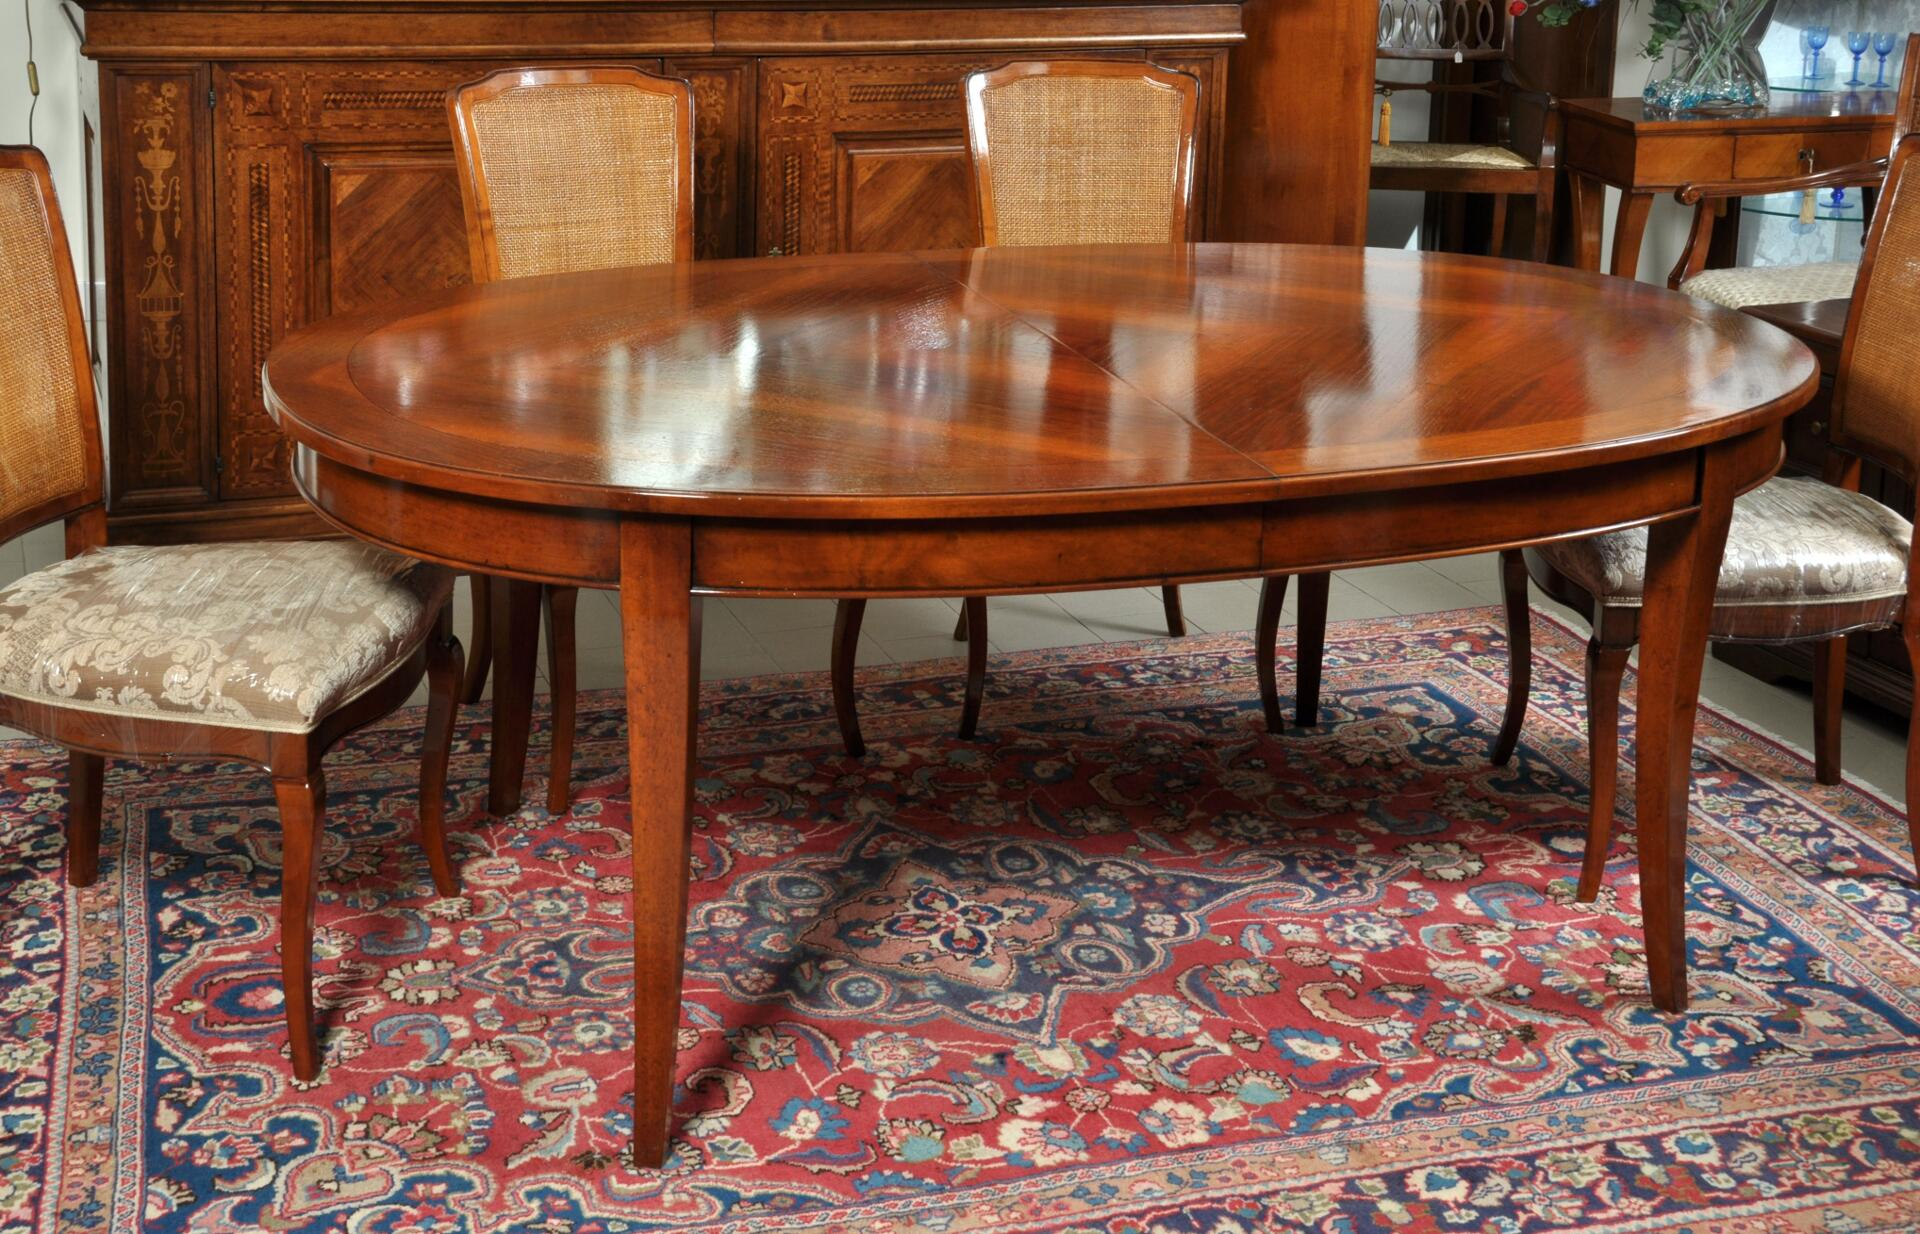 Tavoli Classici Ovali Allungabili.Tavolo Ovale Intarsiato Estensibile